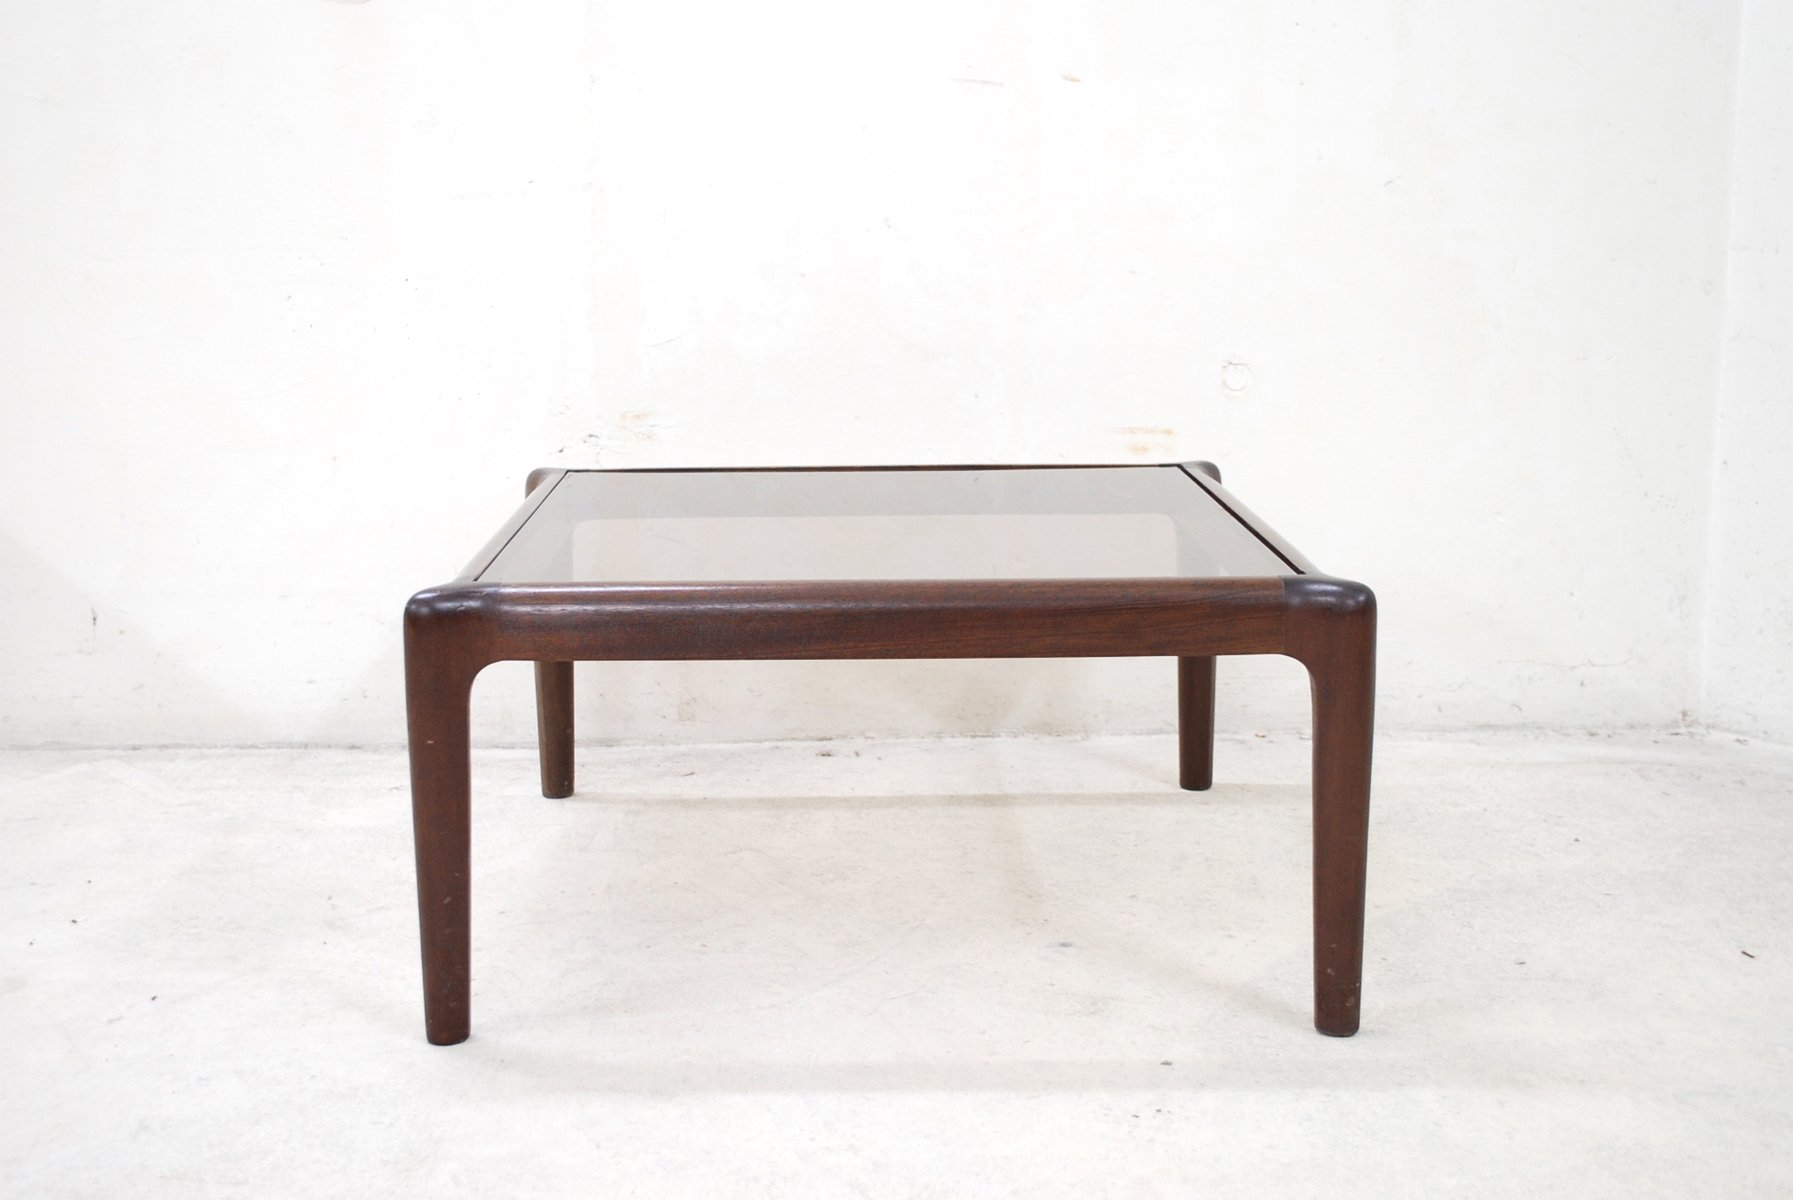 table basse vintage en acajou verre fum en vente sur pamono. Black Bedroom Furniture Sets. Home Design Ideas